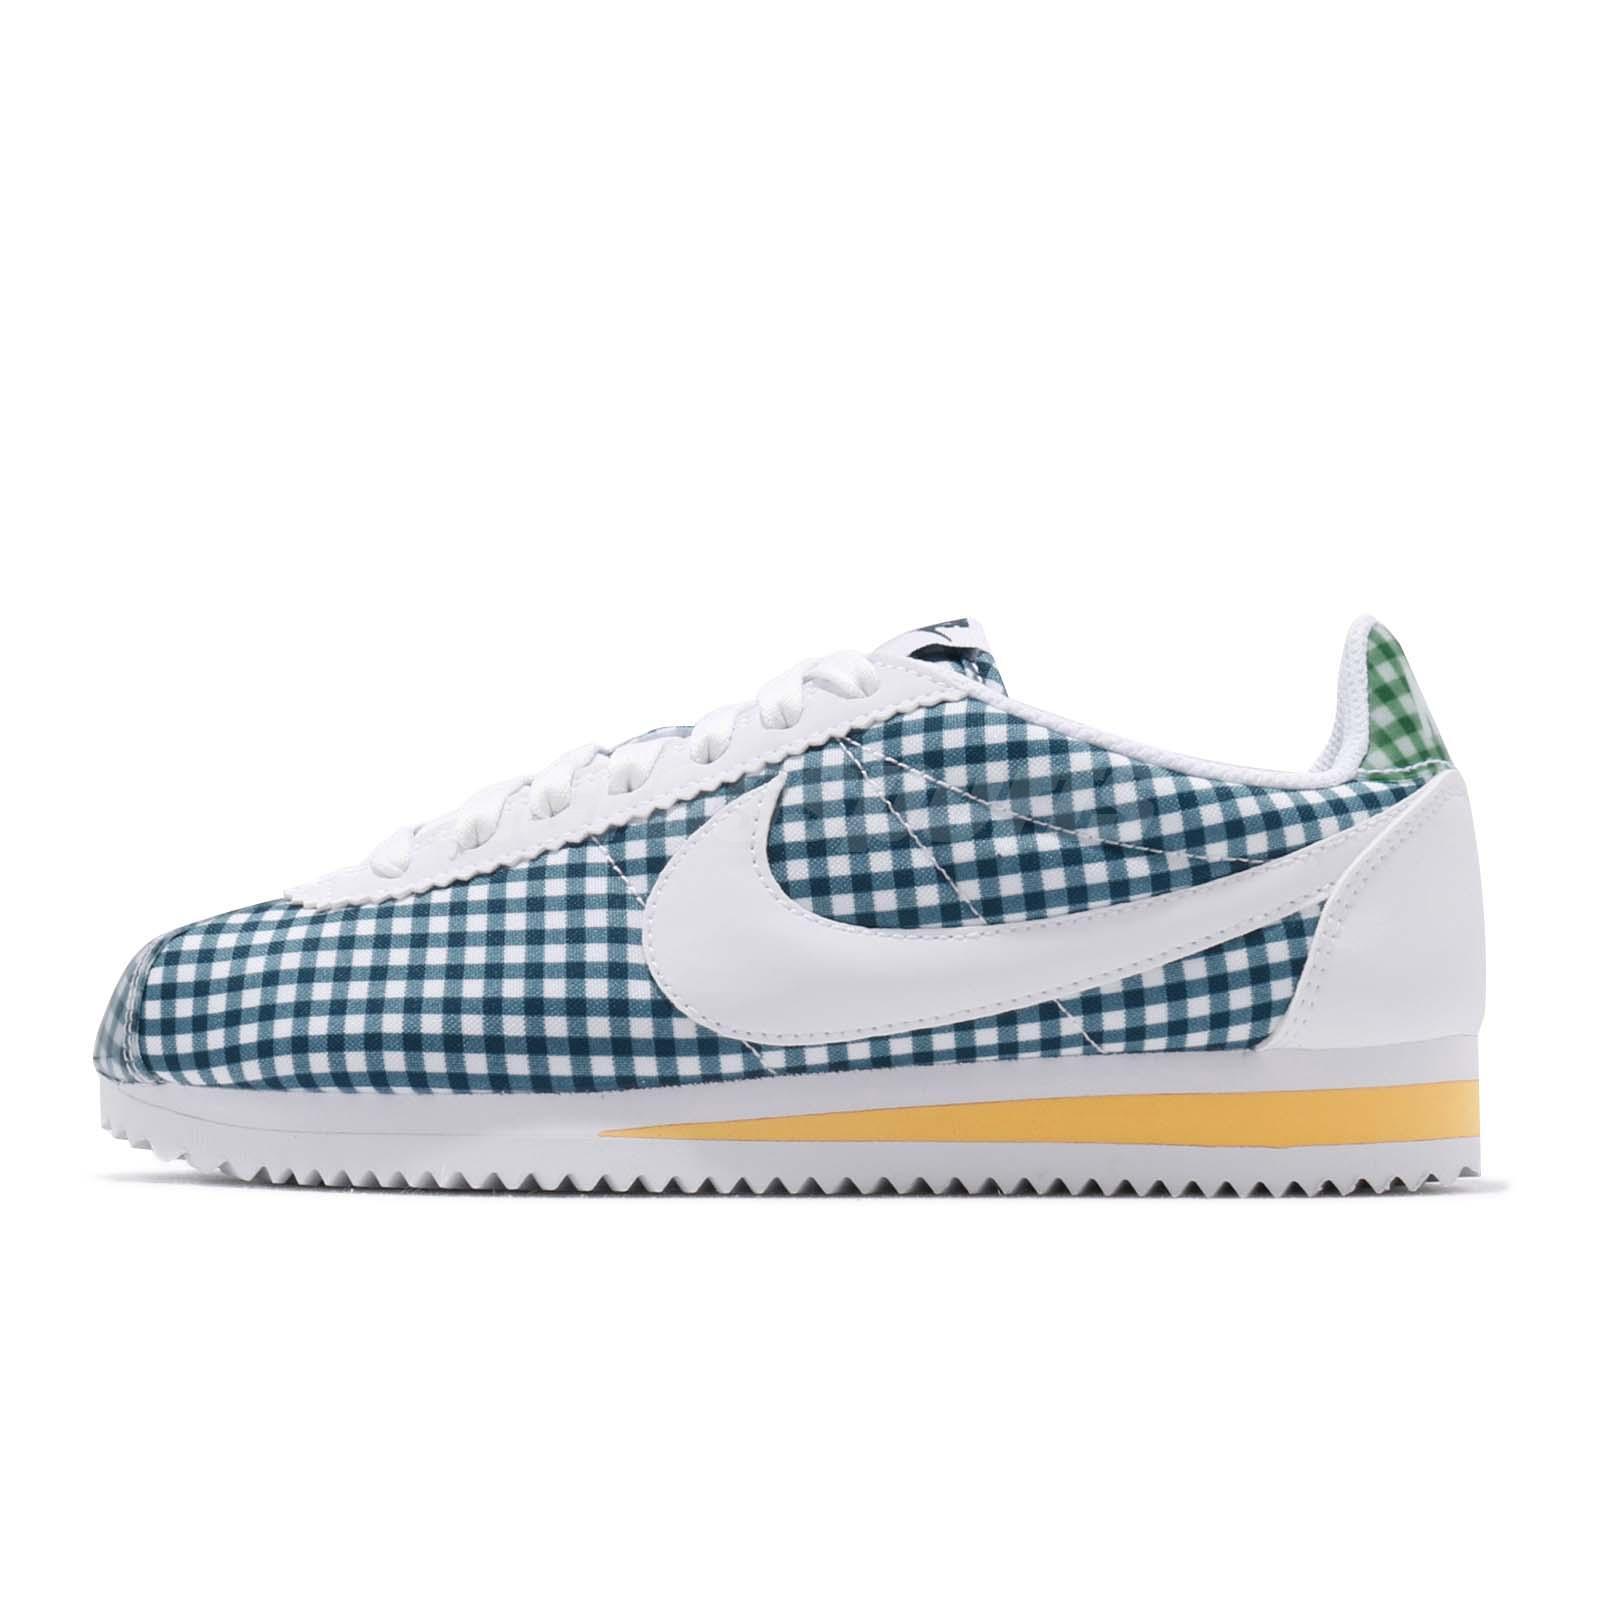 Detalles acerca de Nike Wmns Clásico Cortez Qs cheque Blanco Azul Fuerza Mujeres Zapato de correr BV4890 101 mostrar título original